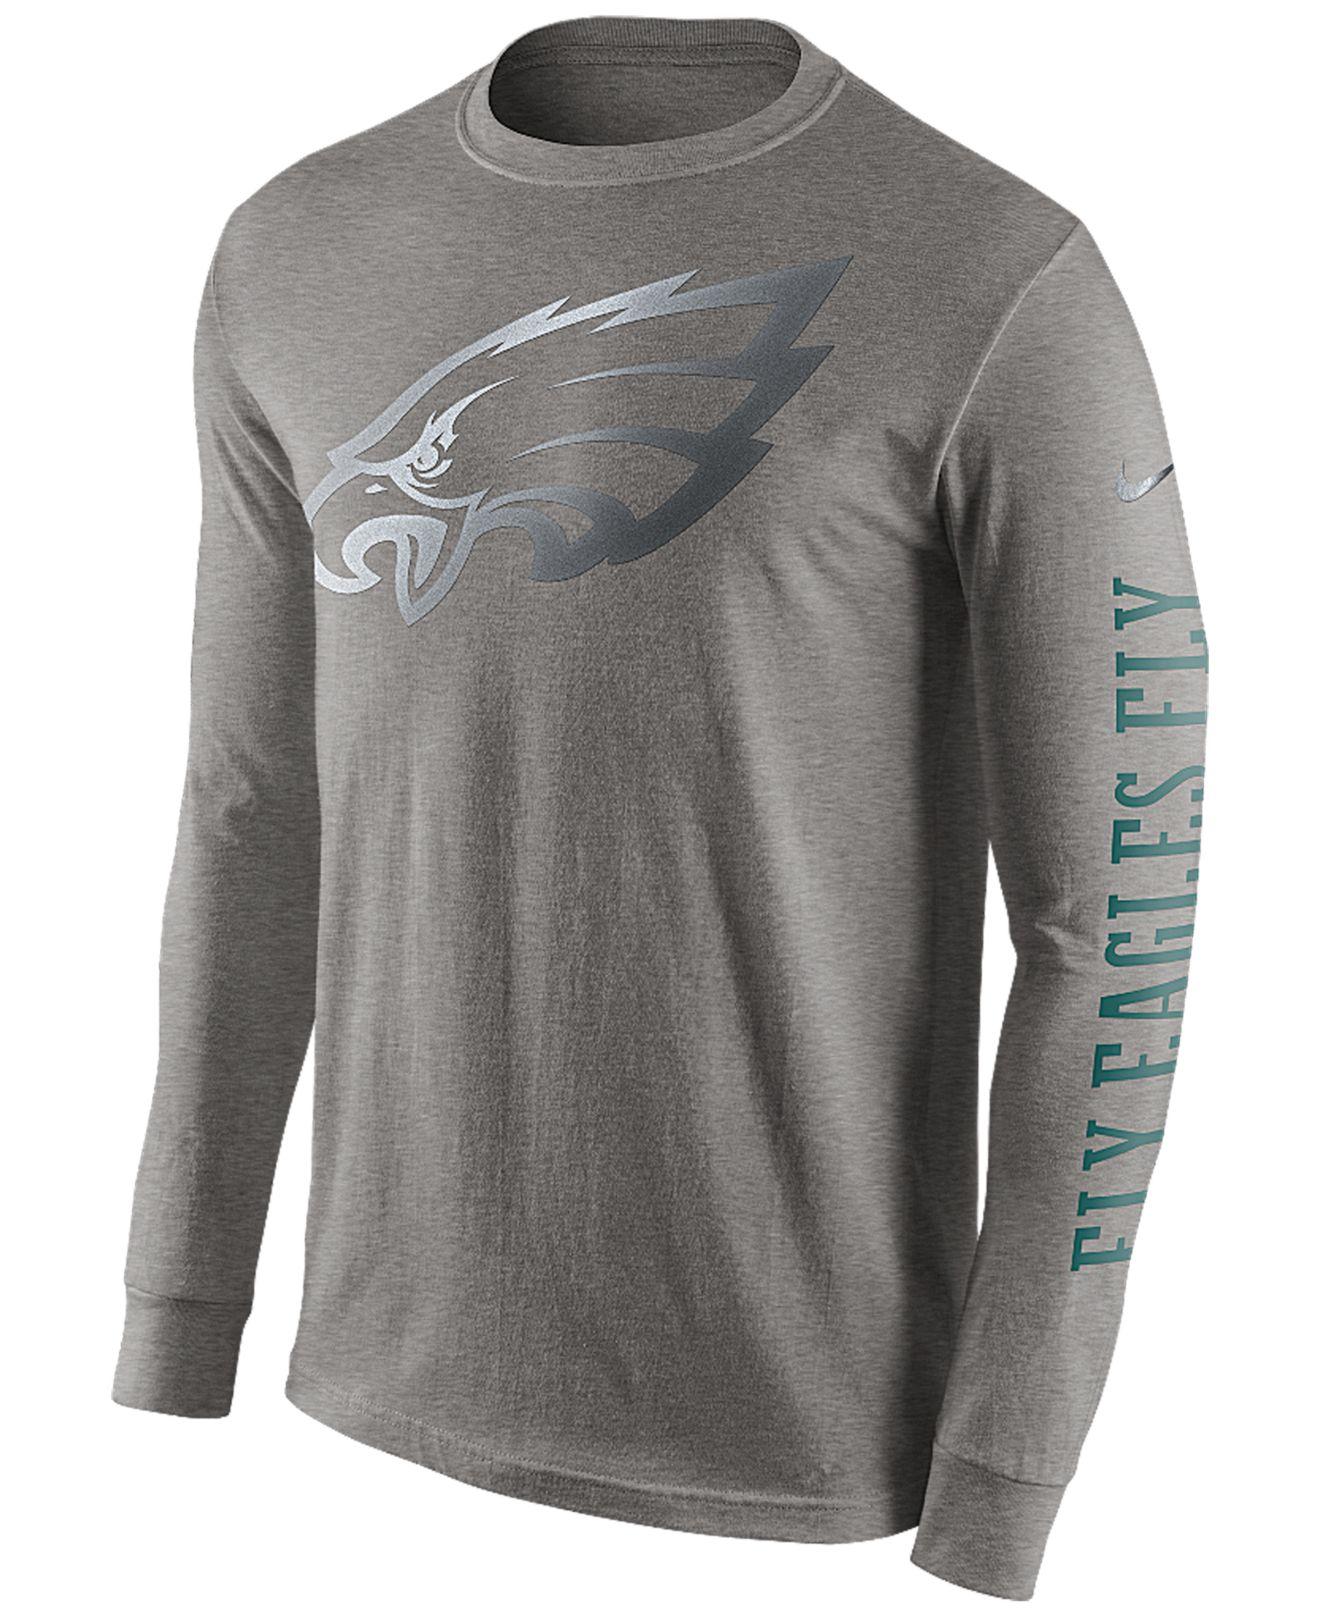 Lyst - Nike Men S Long-Sleeve Philadelphia Eagles Reflective T-Shirt ... 875900abf